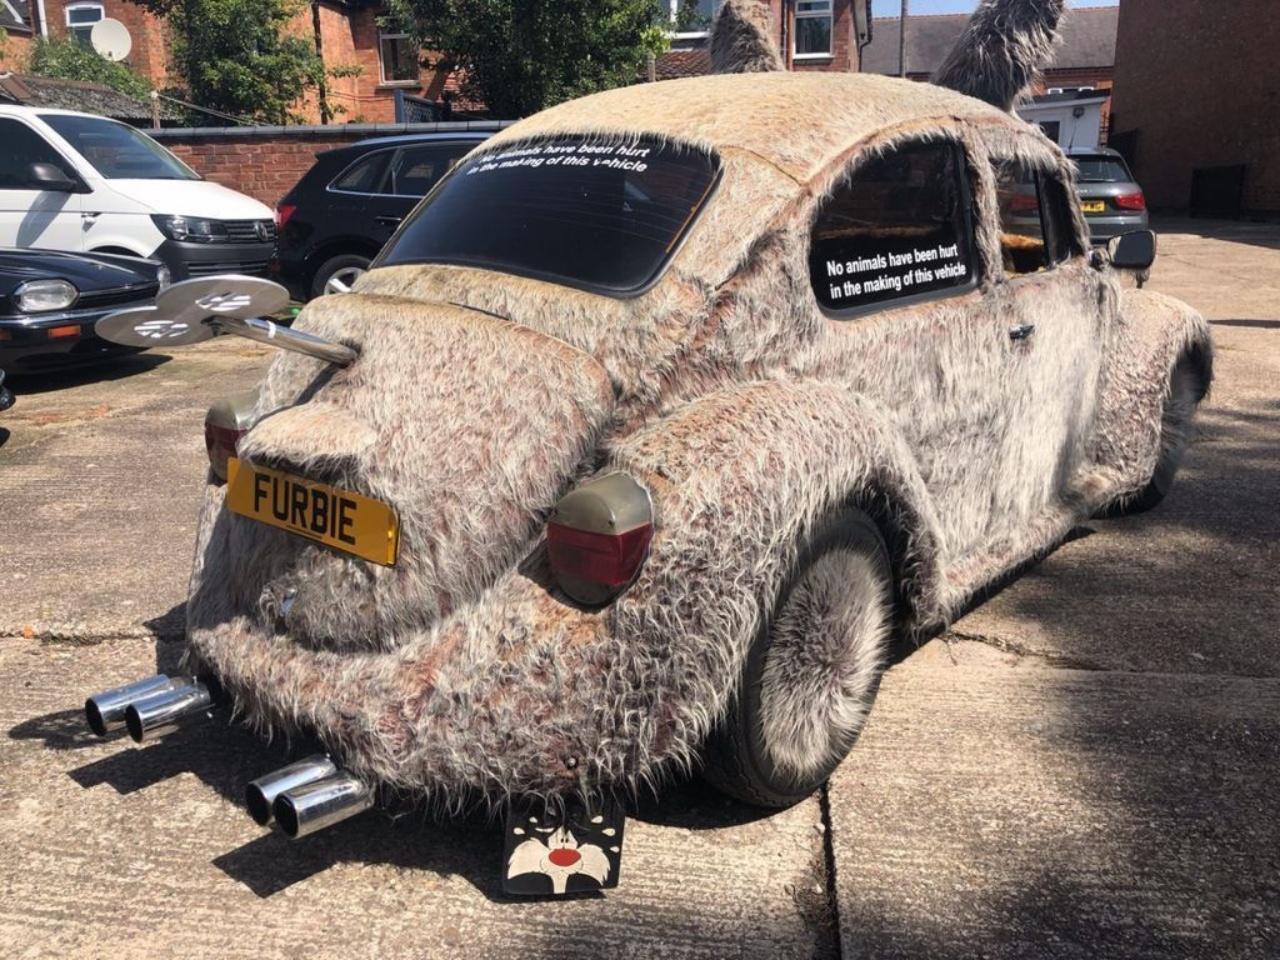 Volkswagen-Beetle-Furbie-1978-18